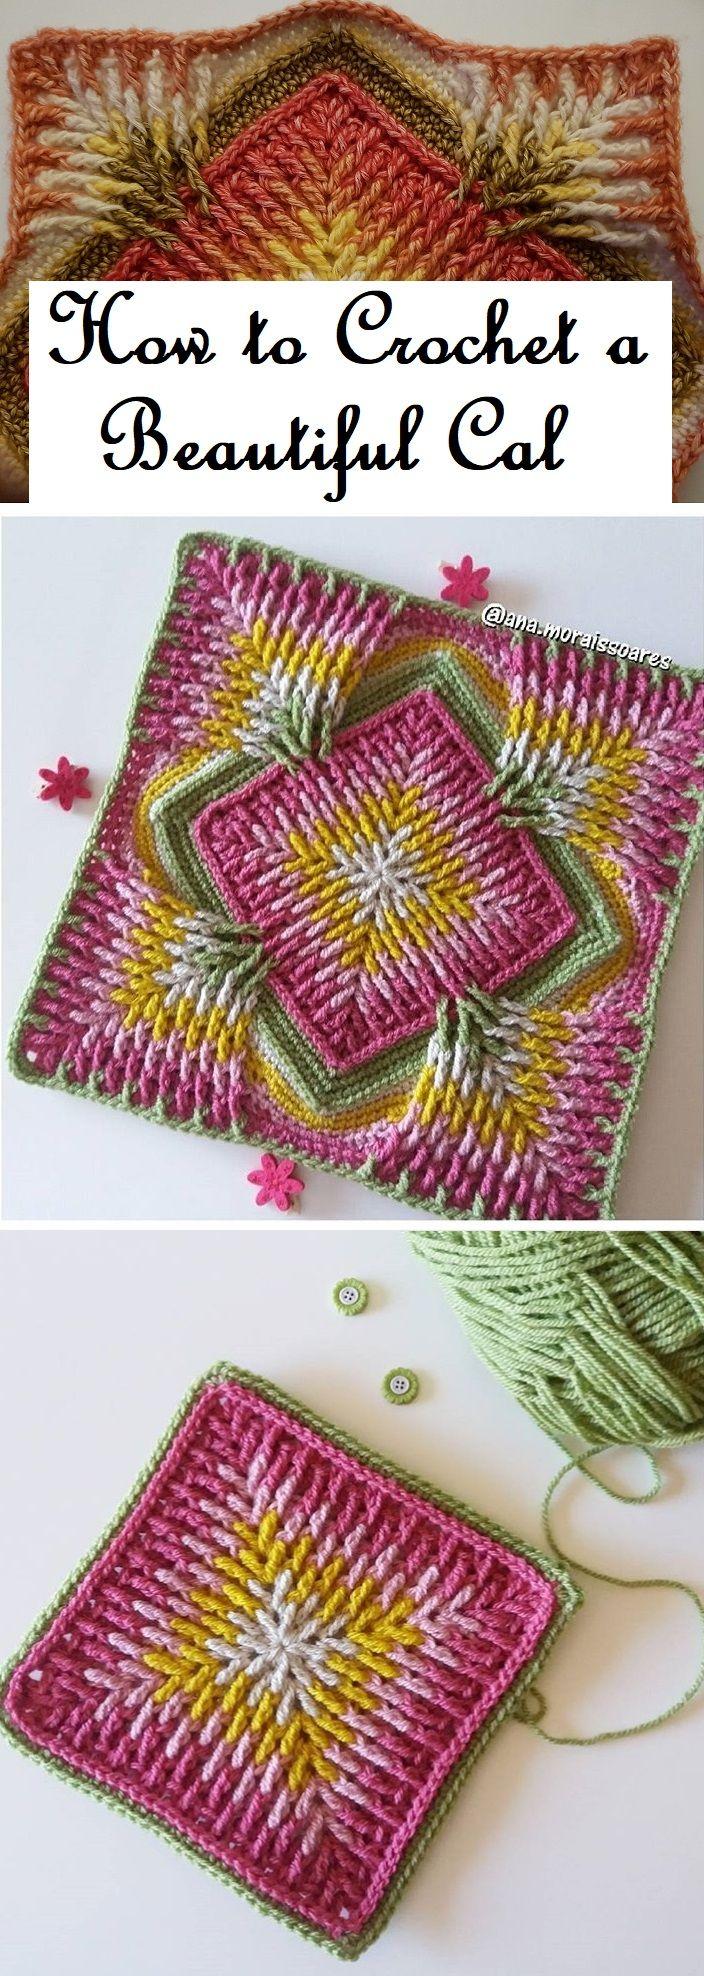 Crochet Cal Tutorial T Ileri Pinterest Trippy Hippy Afghan Pattern Kingdom Design Peak Blocks Patterns Squares